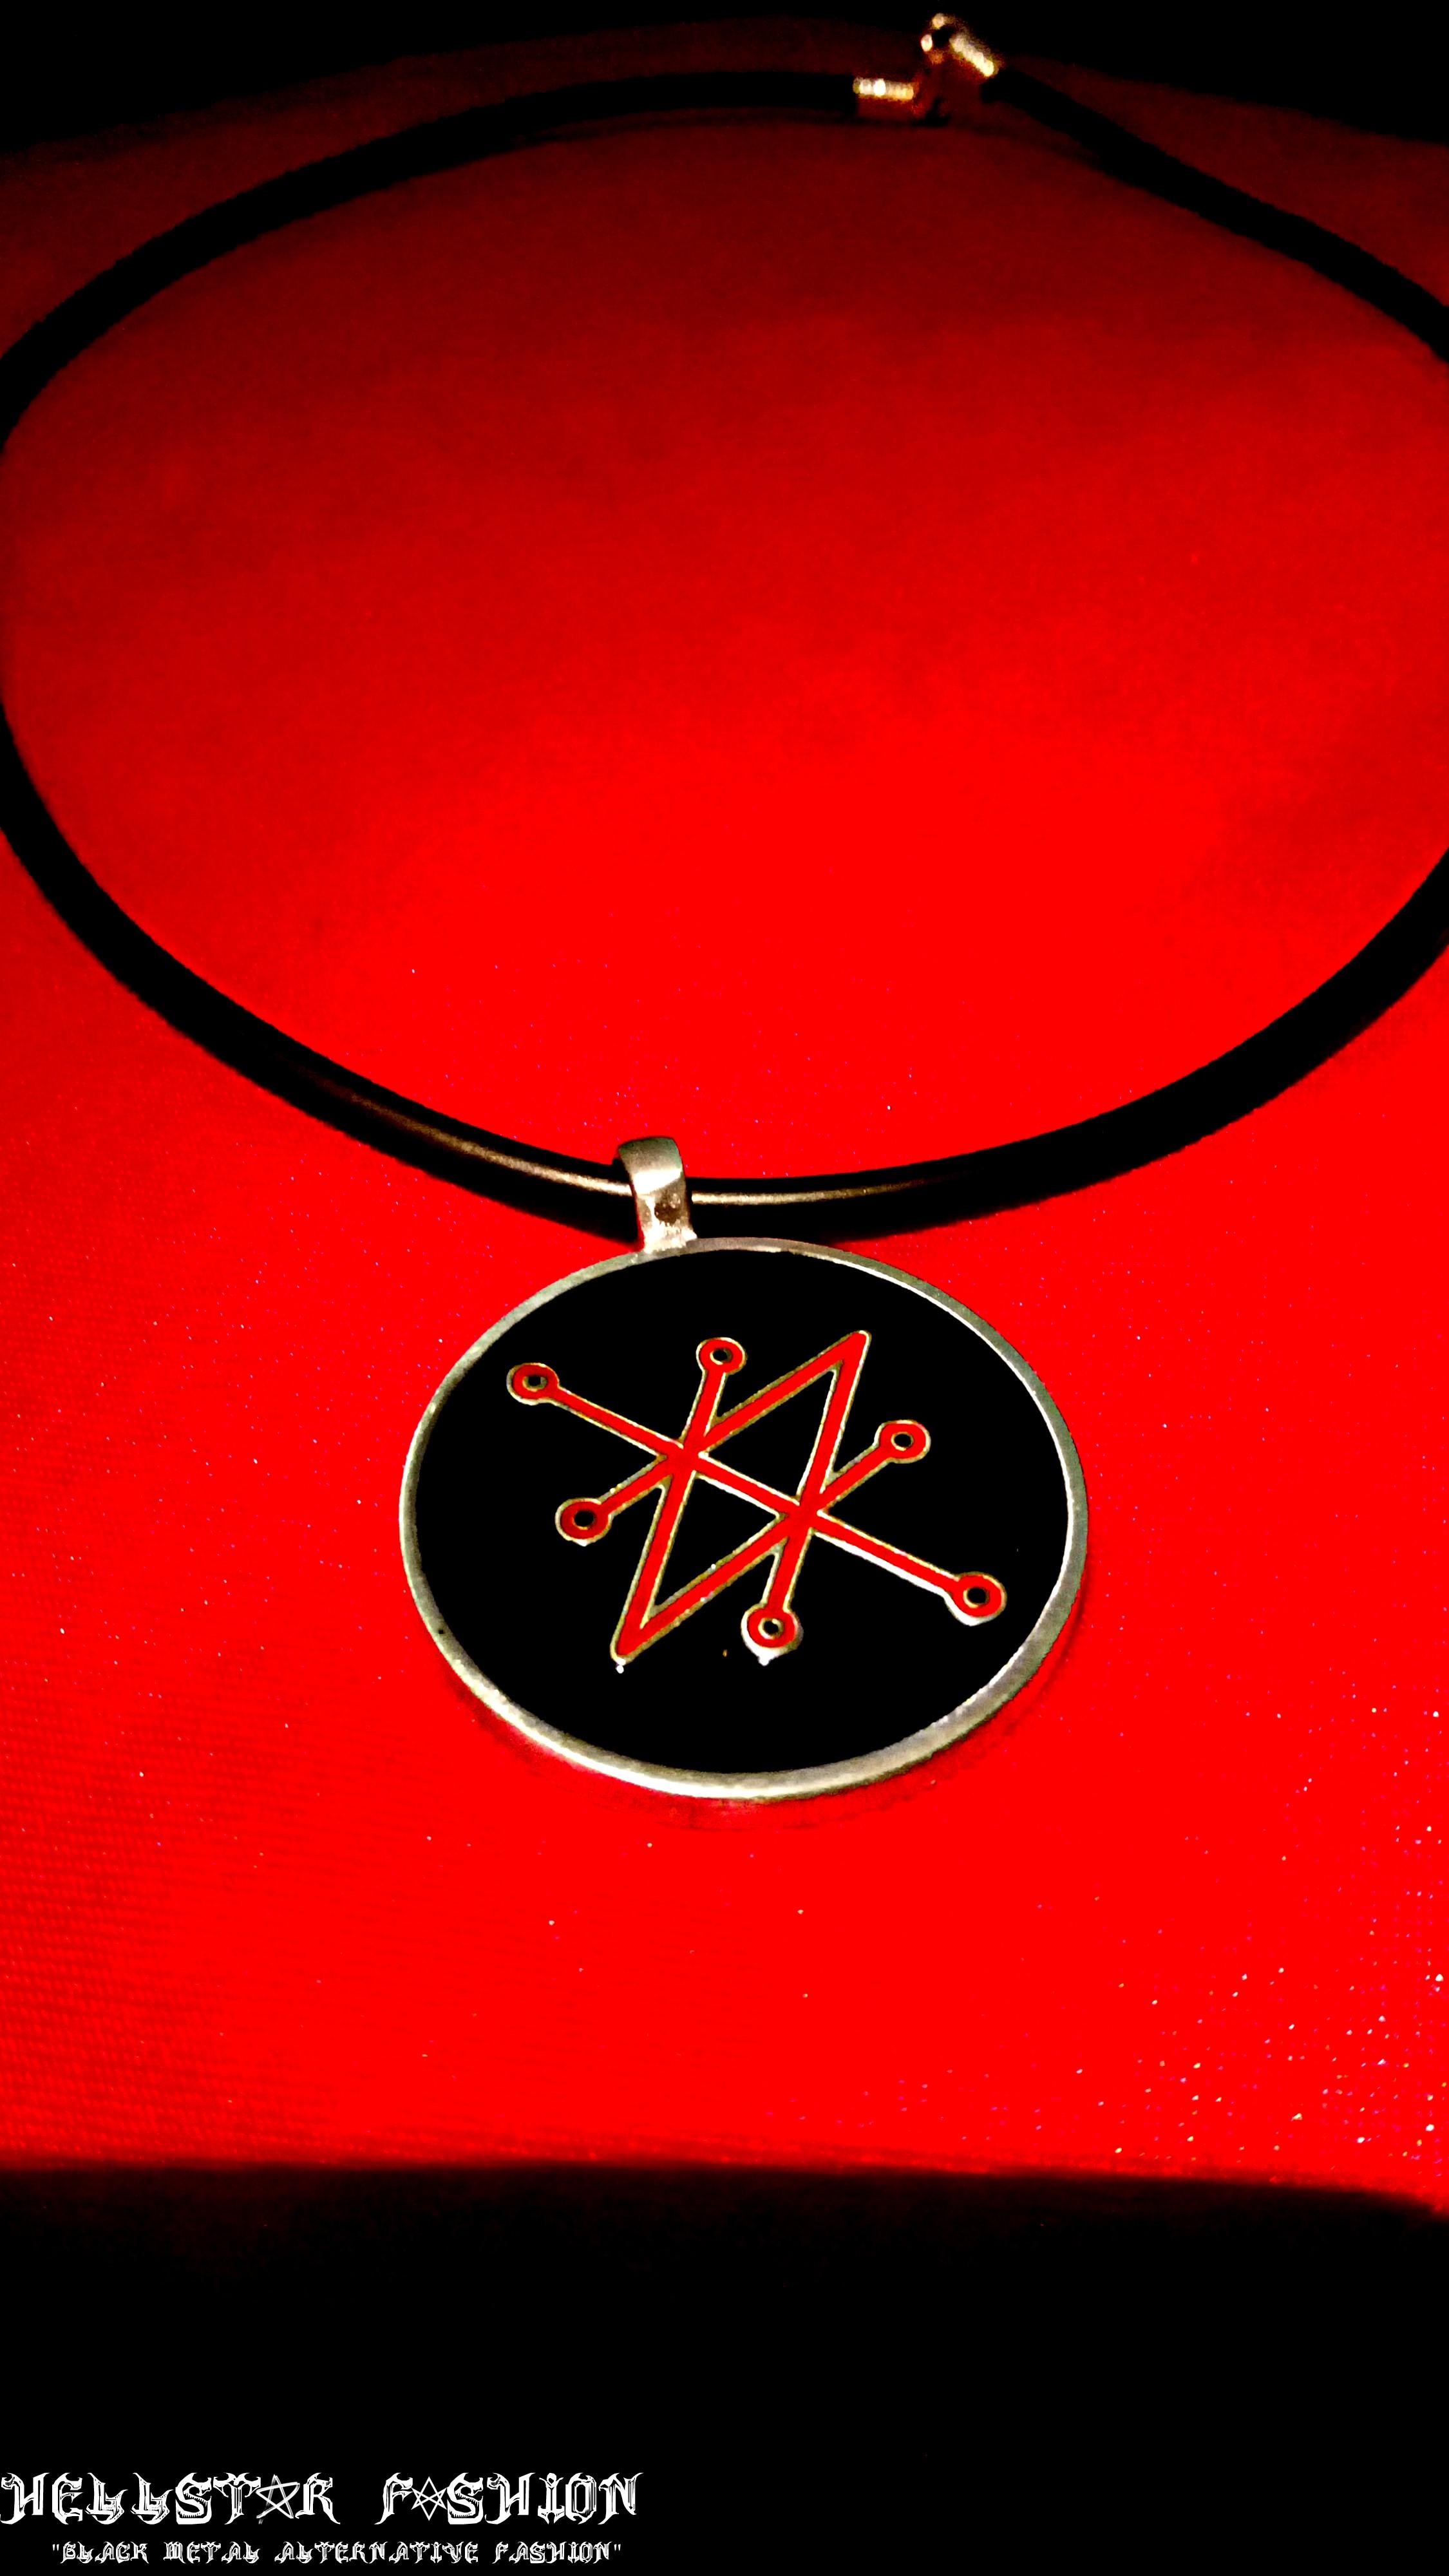 azazel sigil of saturn satanic demon ritual occult black magick pendant  choker necklace from Hellstar Fashion